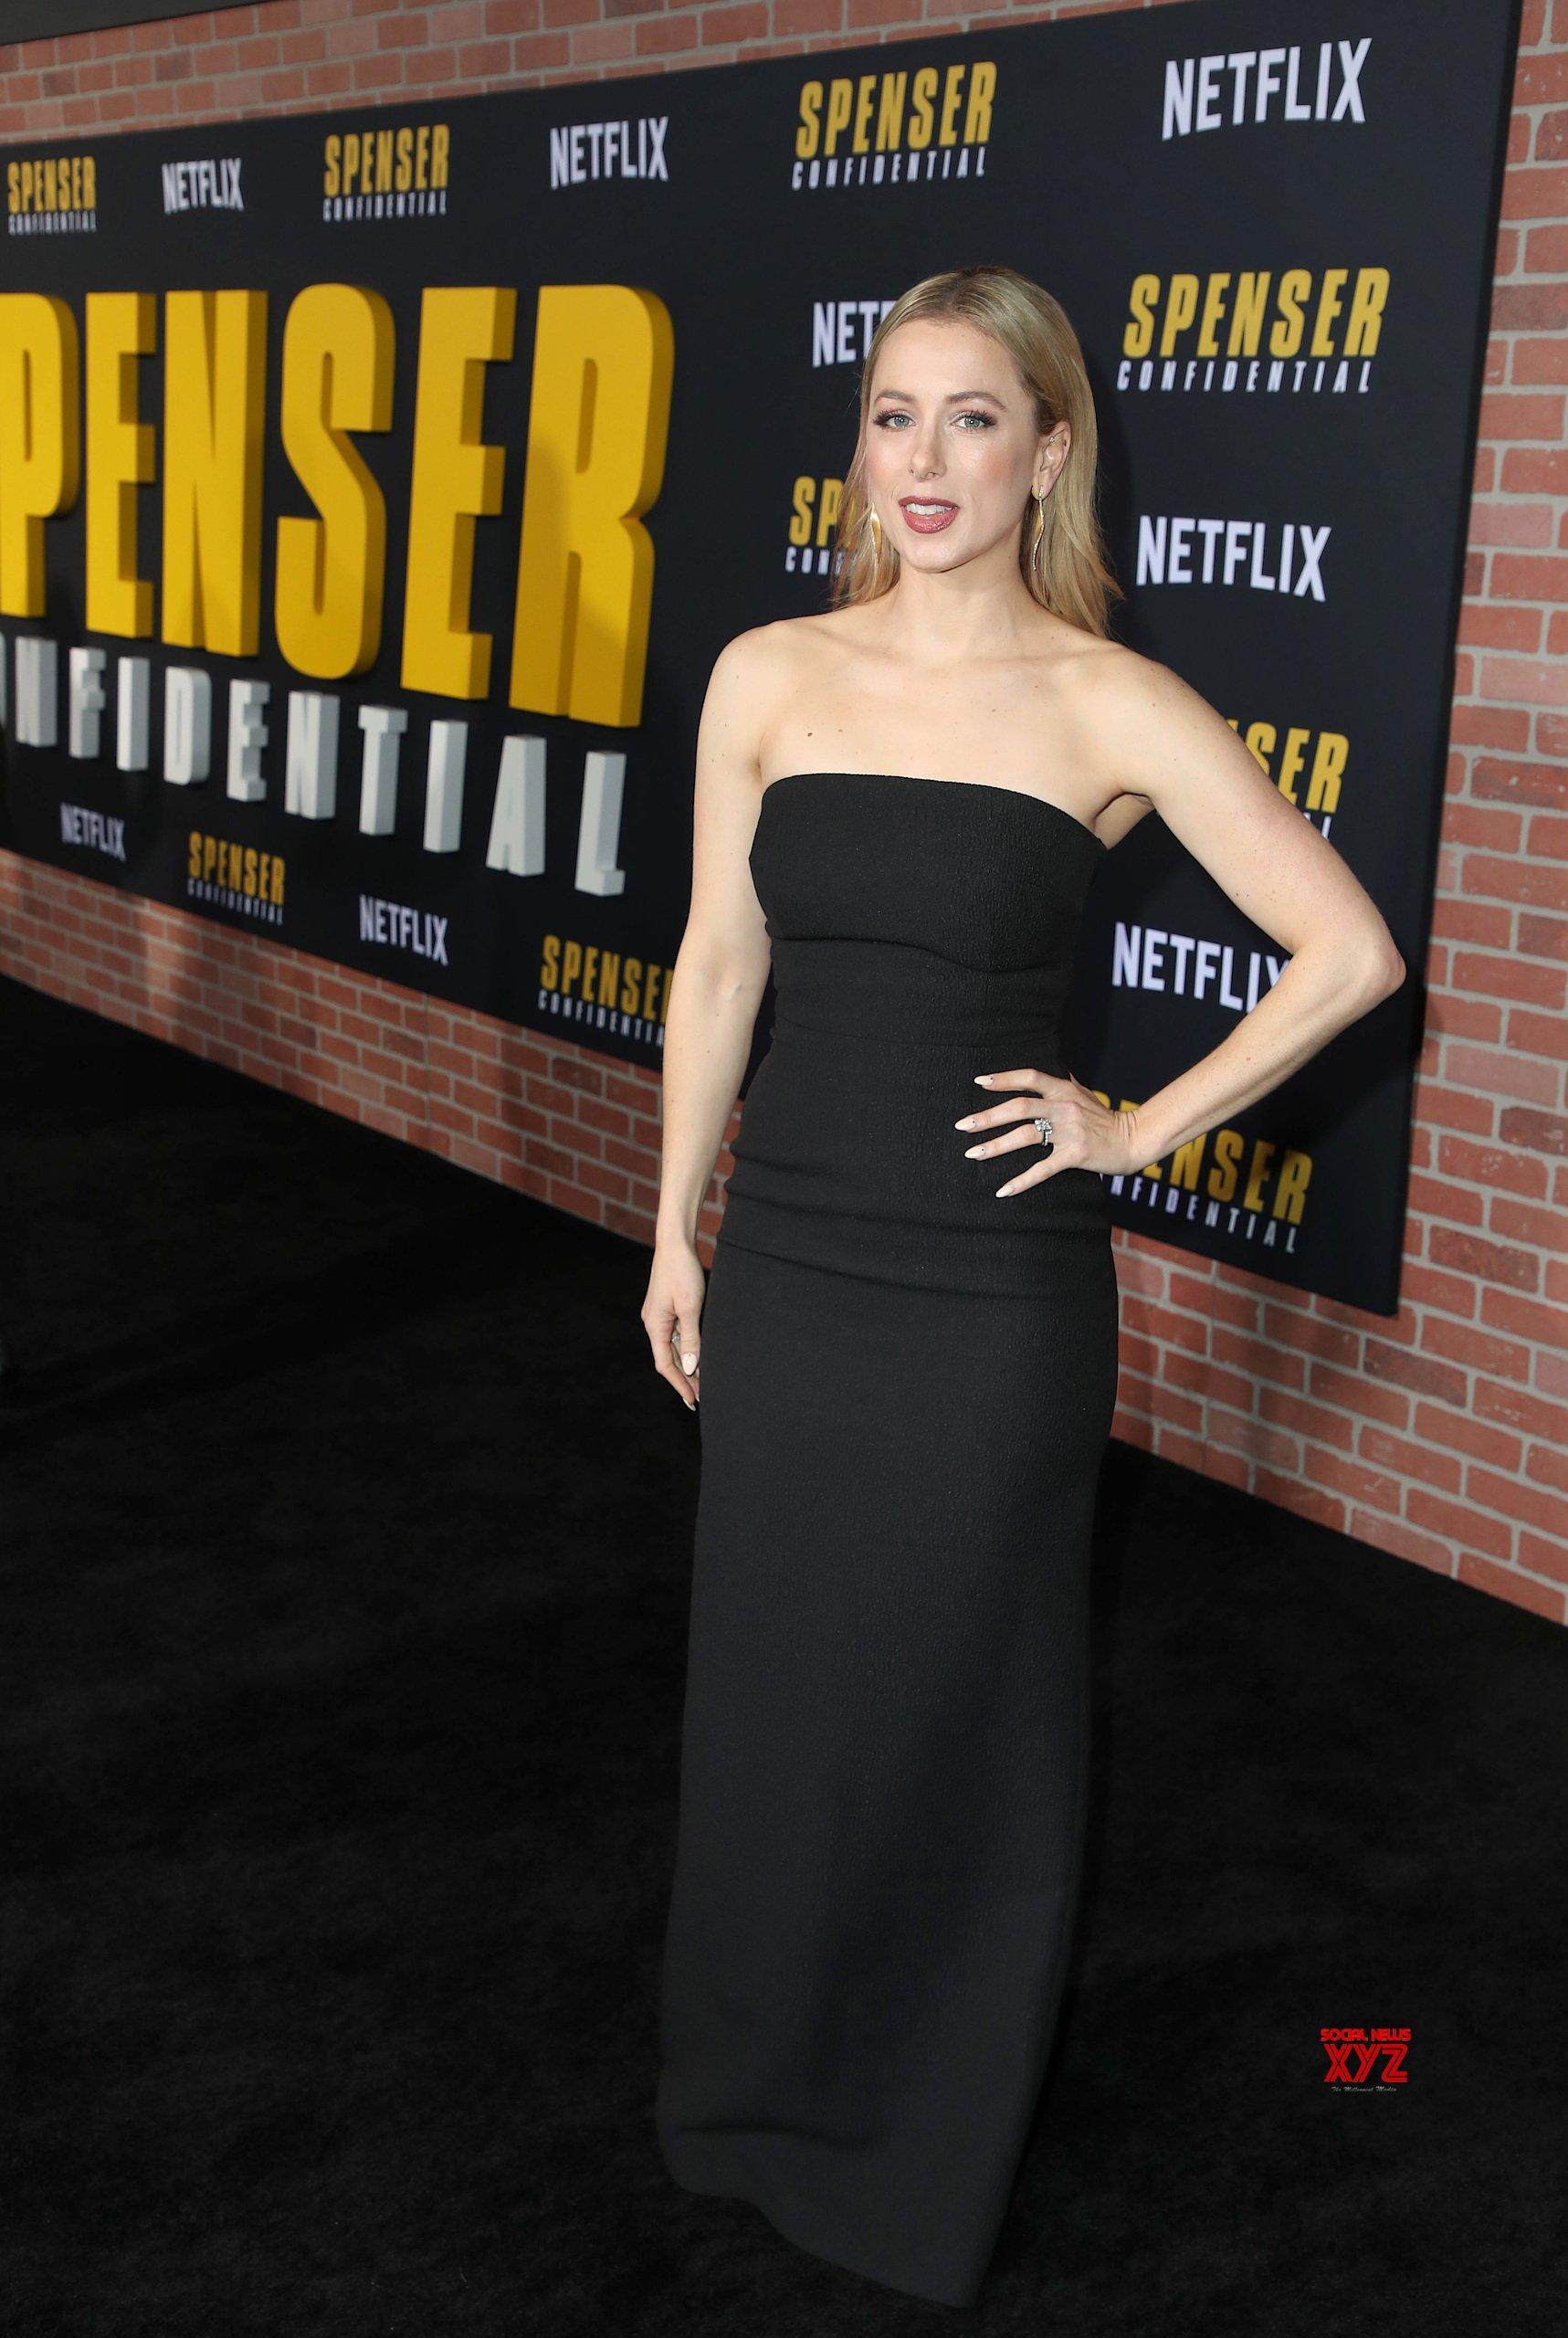 Spenser Confidential Movie Premiere Hd Stills Social News Xyz